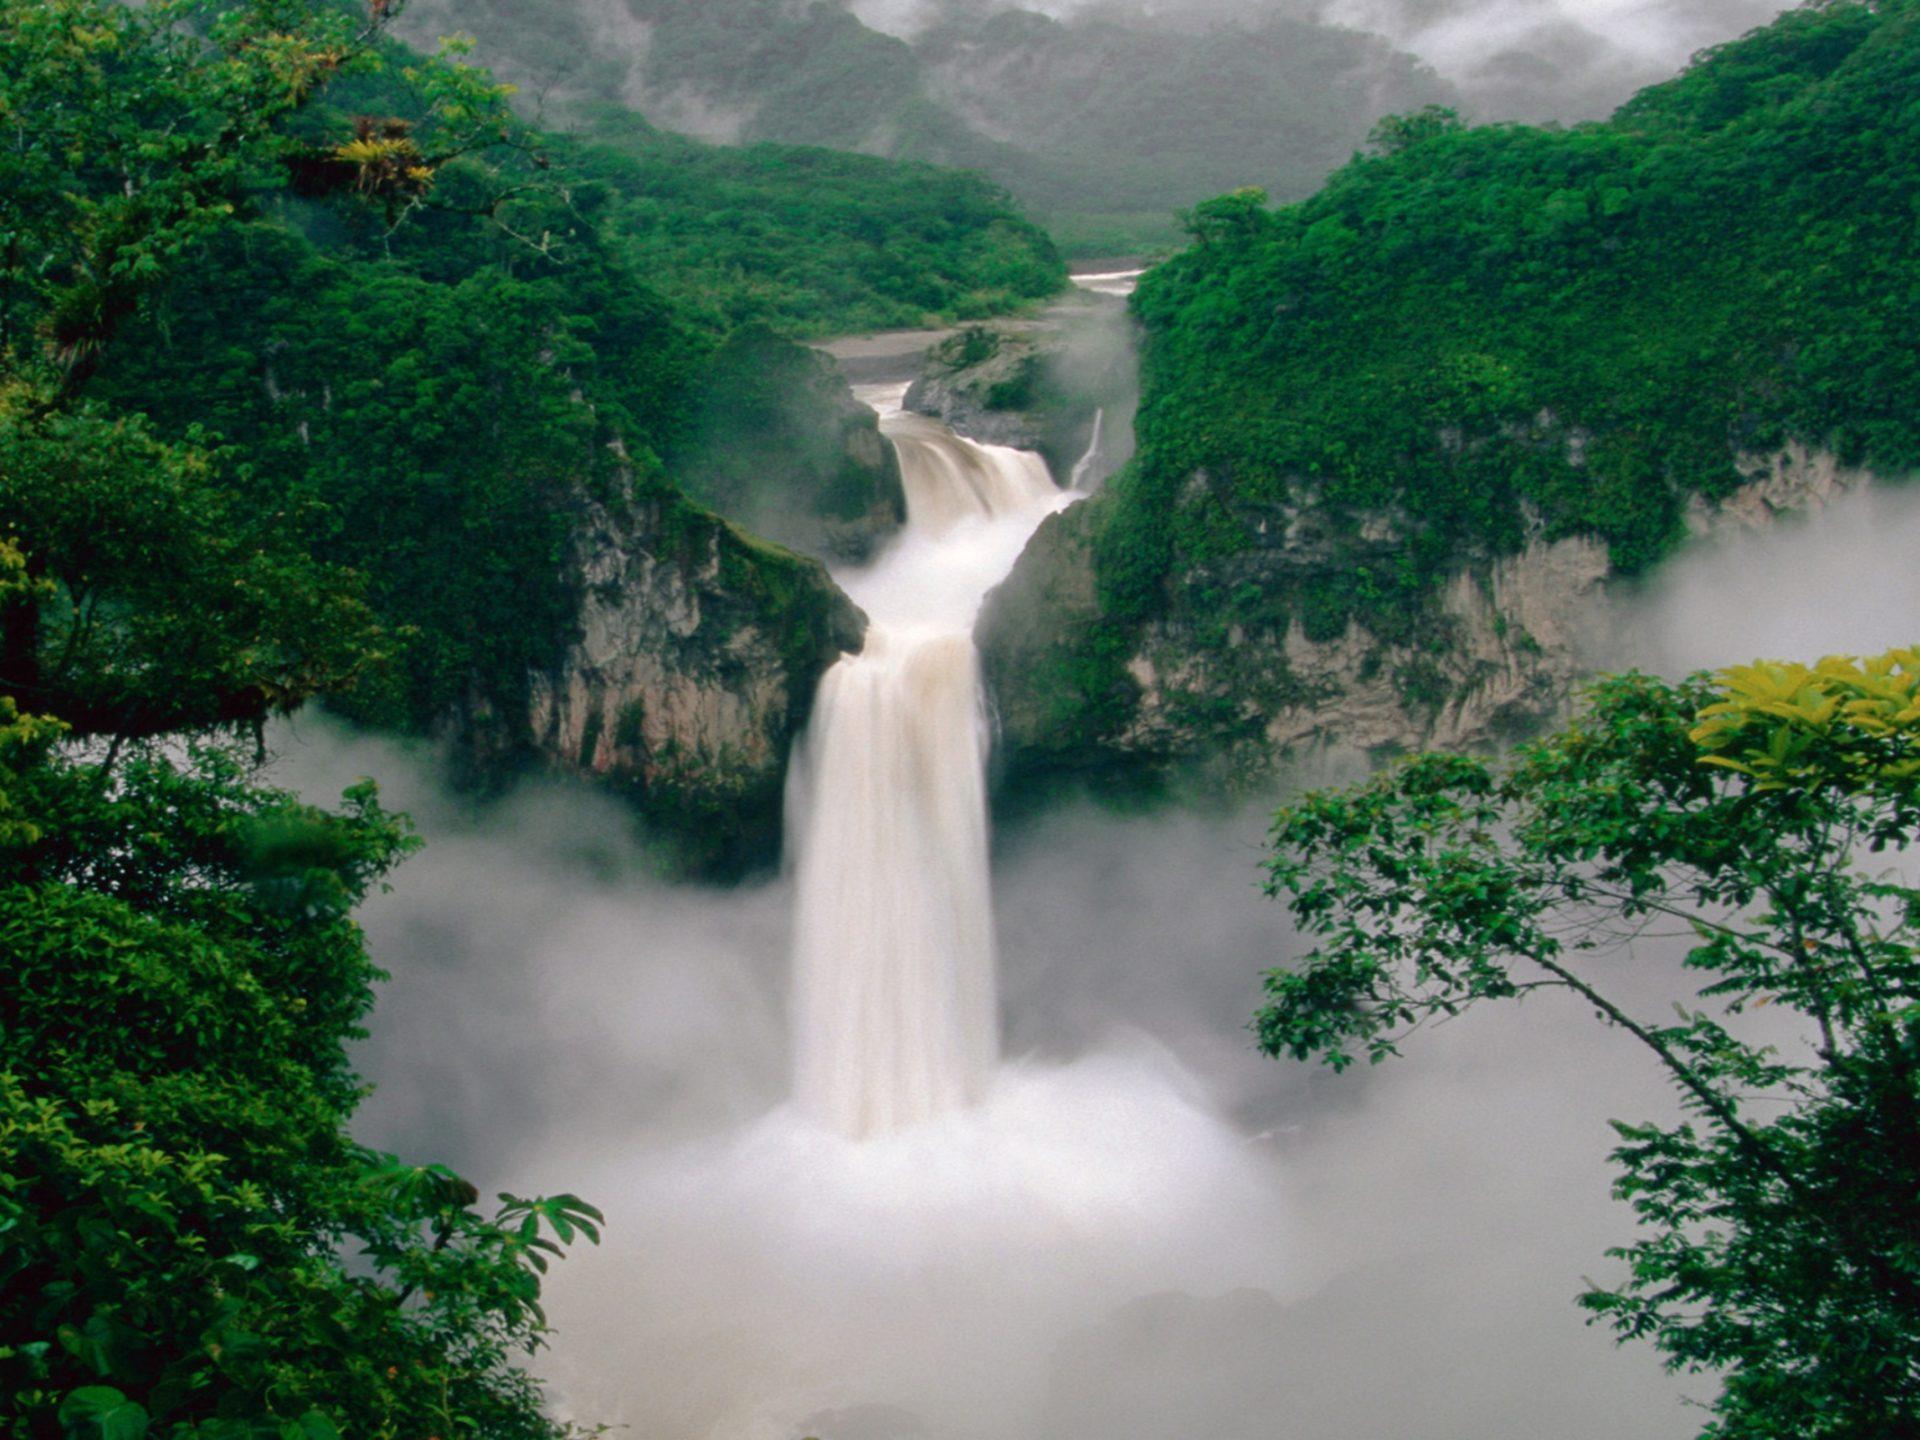 Falls Wallpaper Waterfall Wallpapers Waterfall Mountain Fores Hd Wallpaper